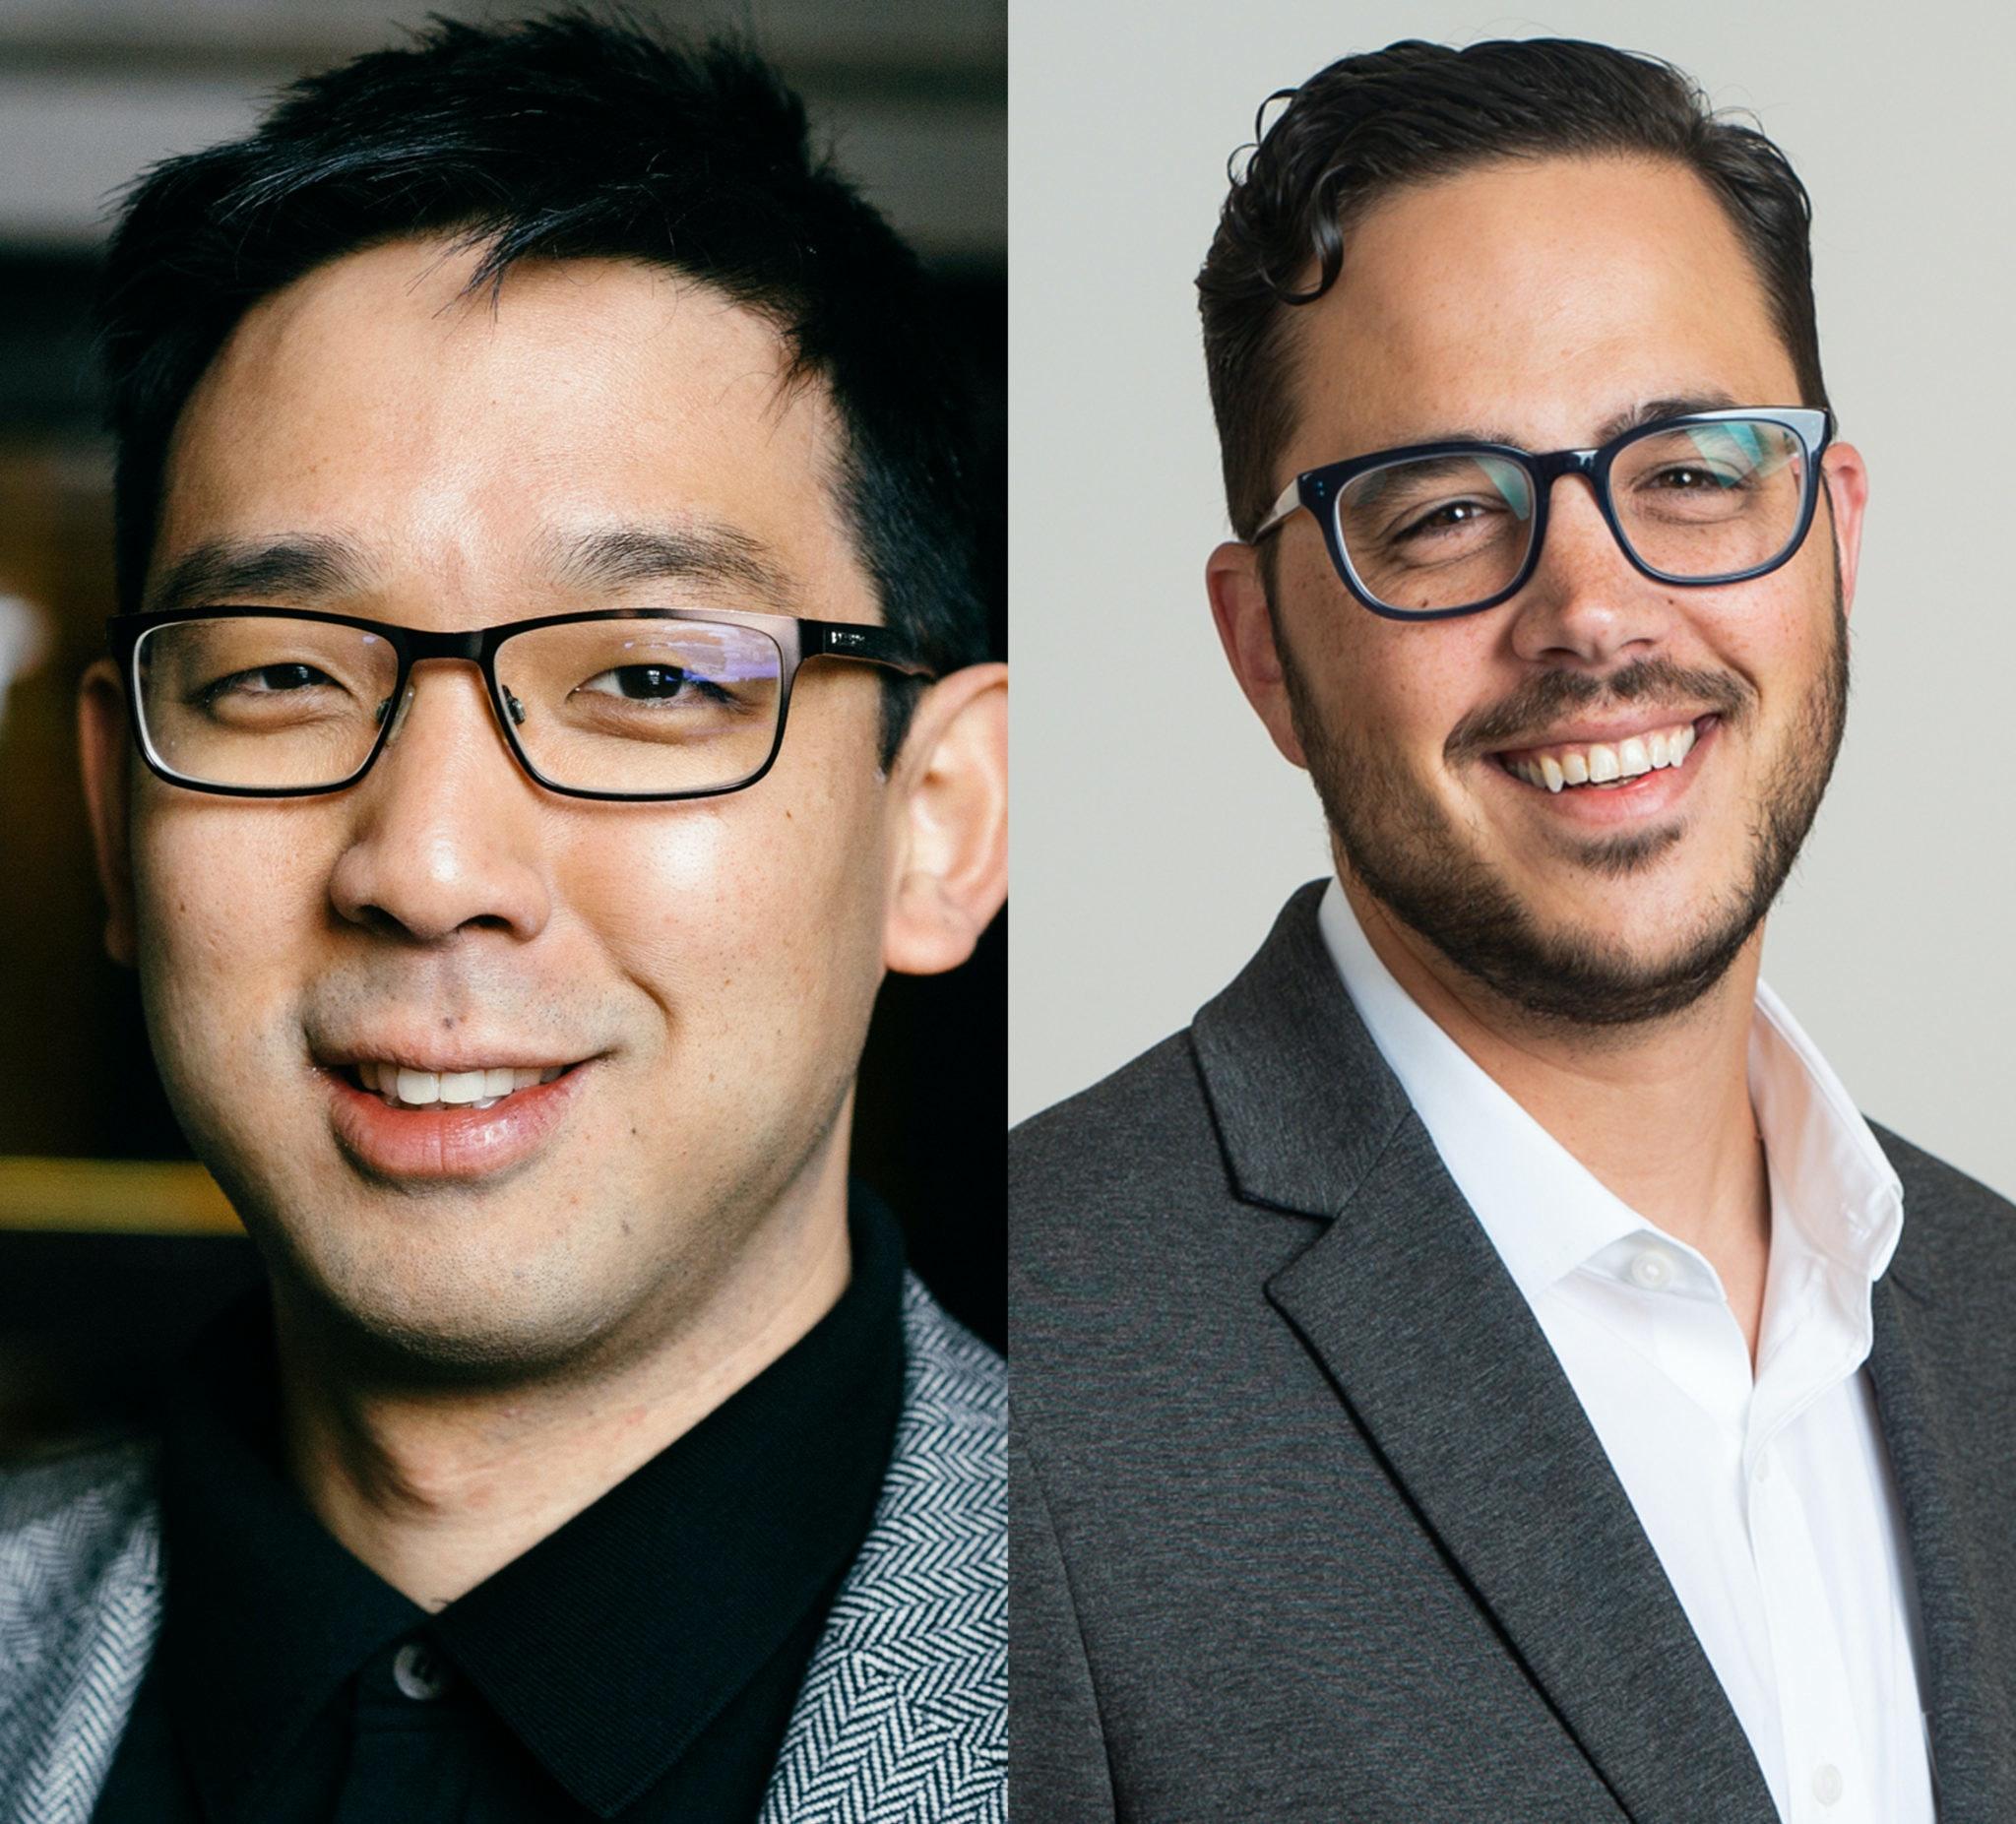 Robert Kim+TJ Abood MTP Headshots